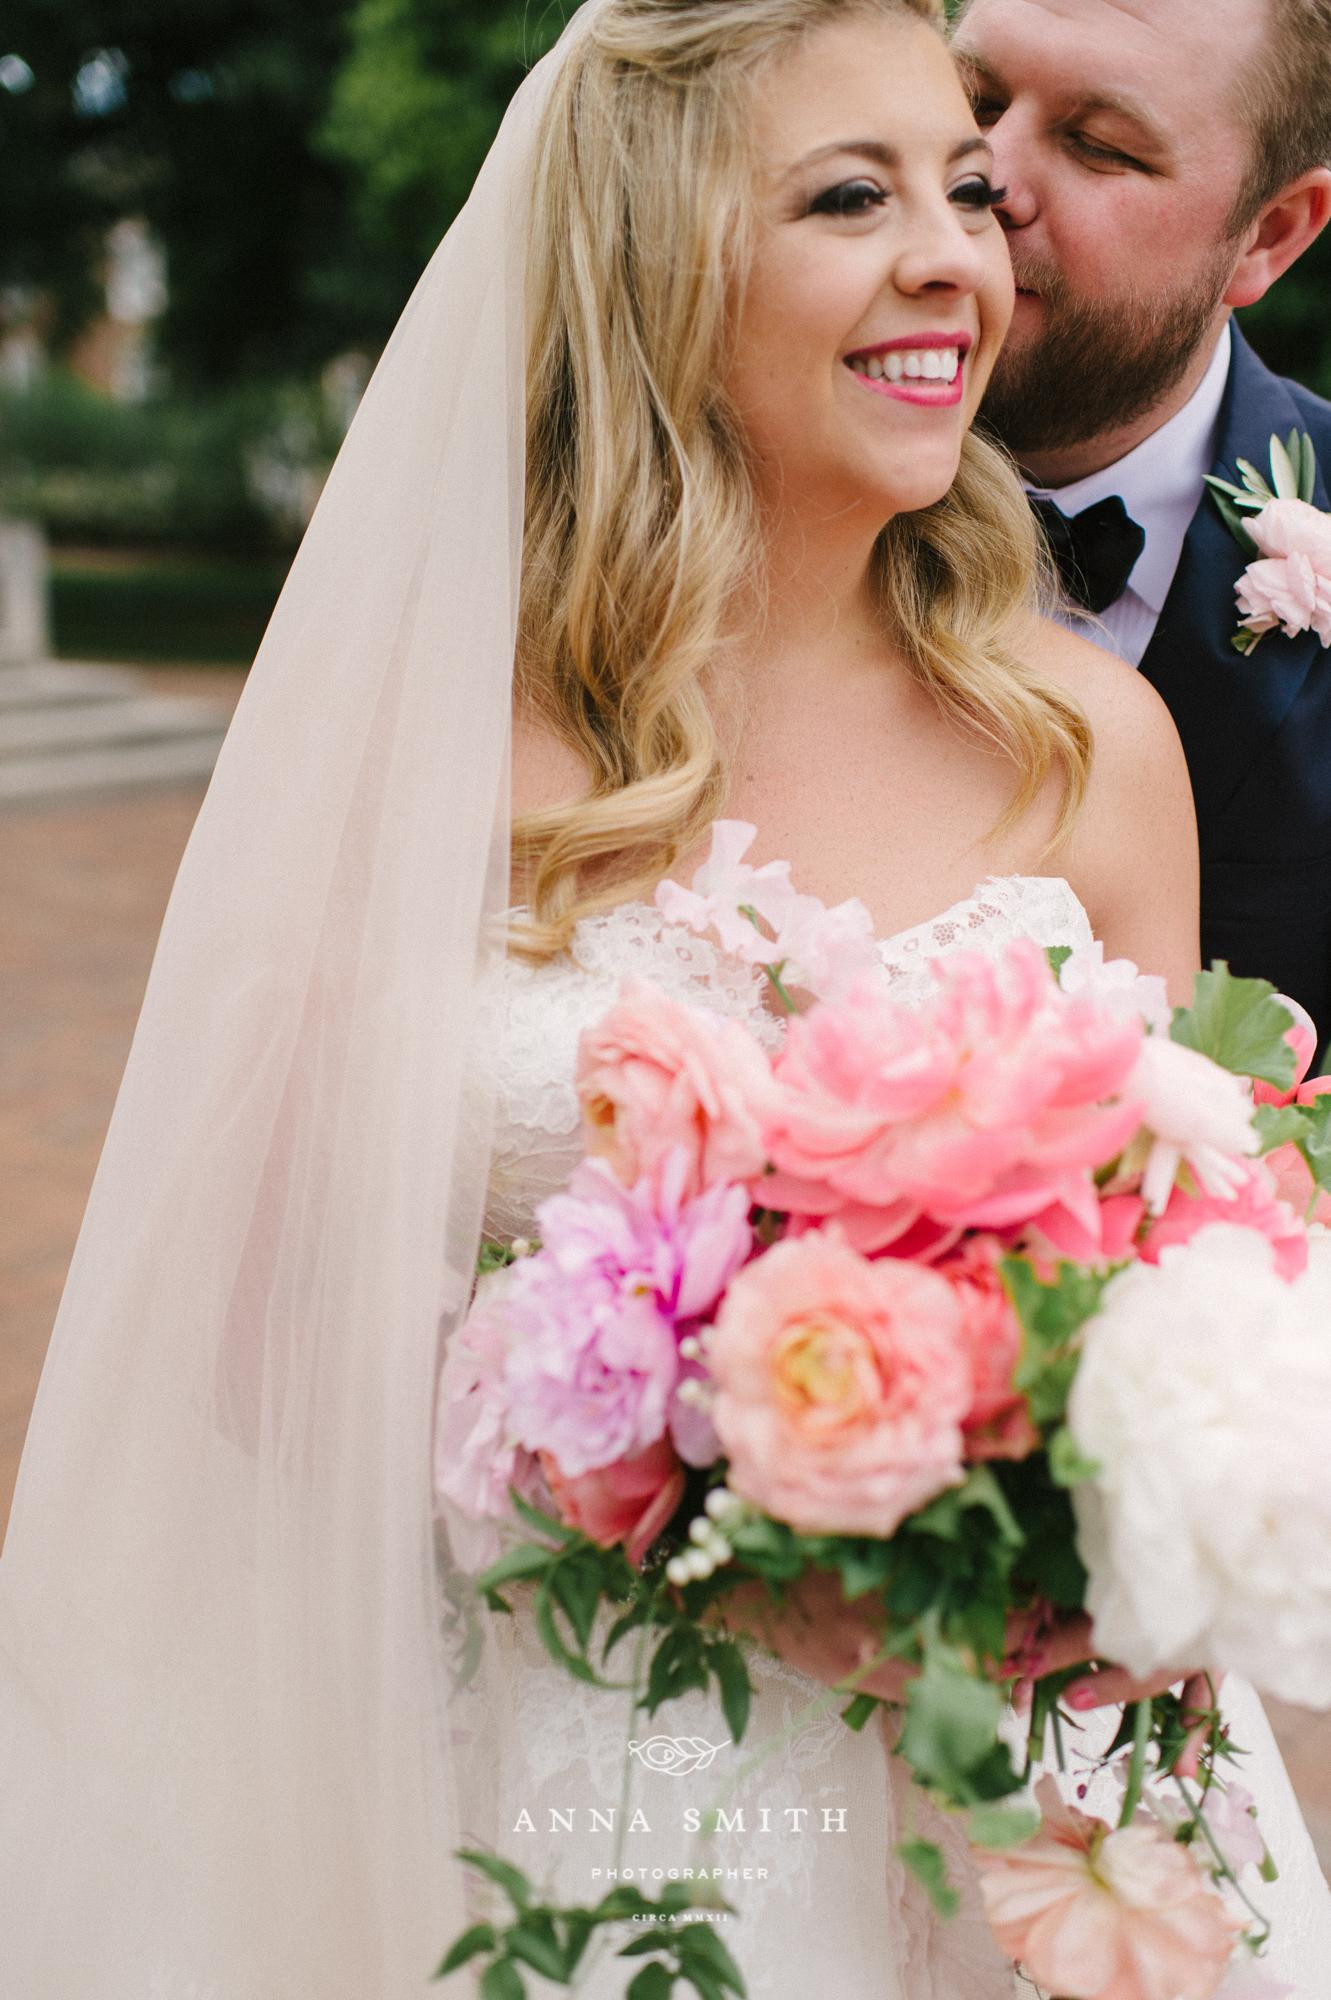 web 17- 4-W-CD-heather brandon wedding perkins adolphus-846.jpg